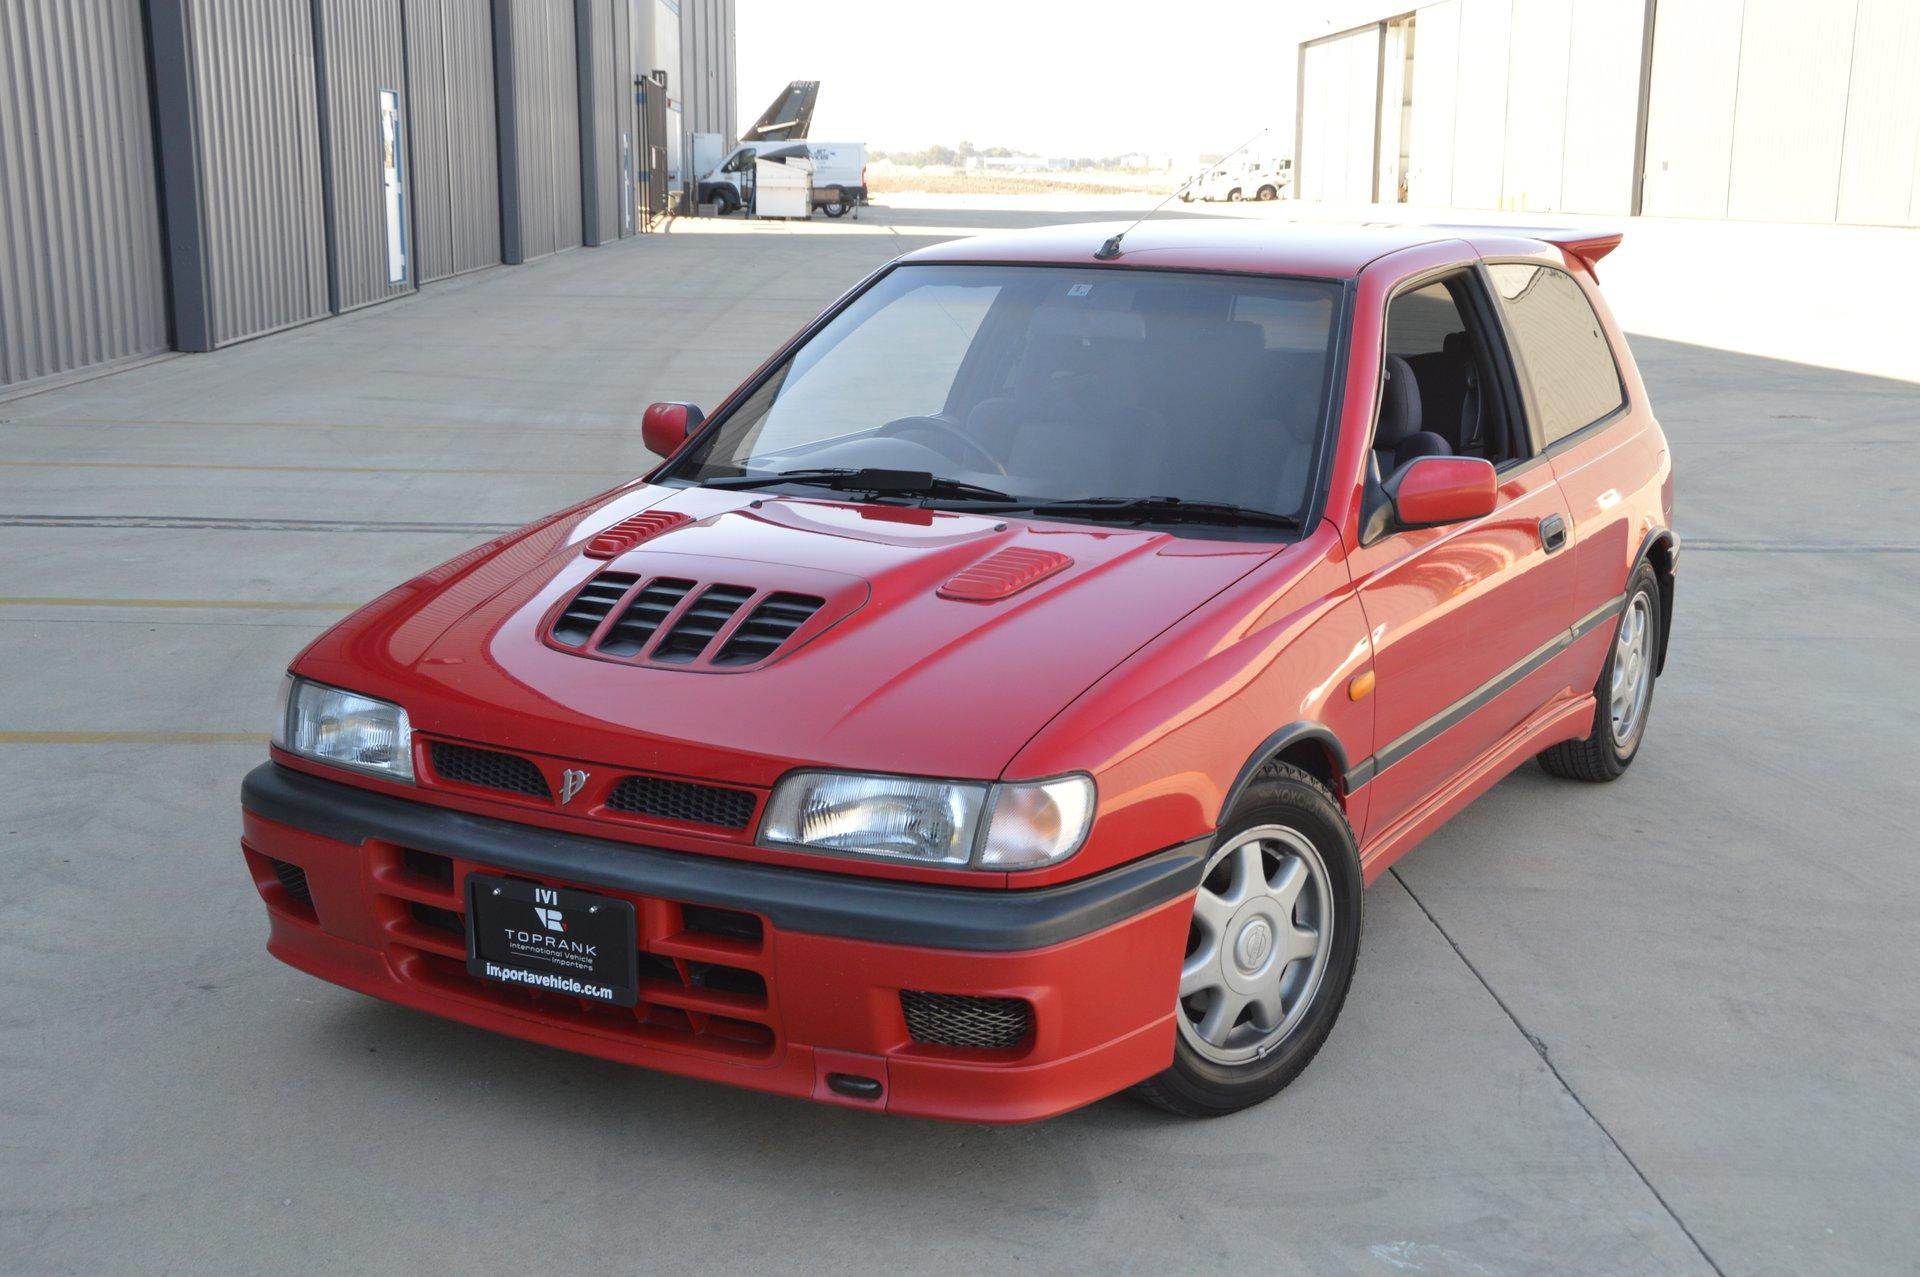 1990 Nissan Pulsar